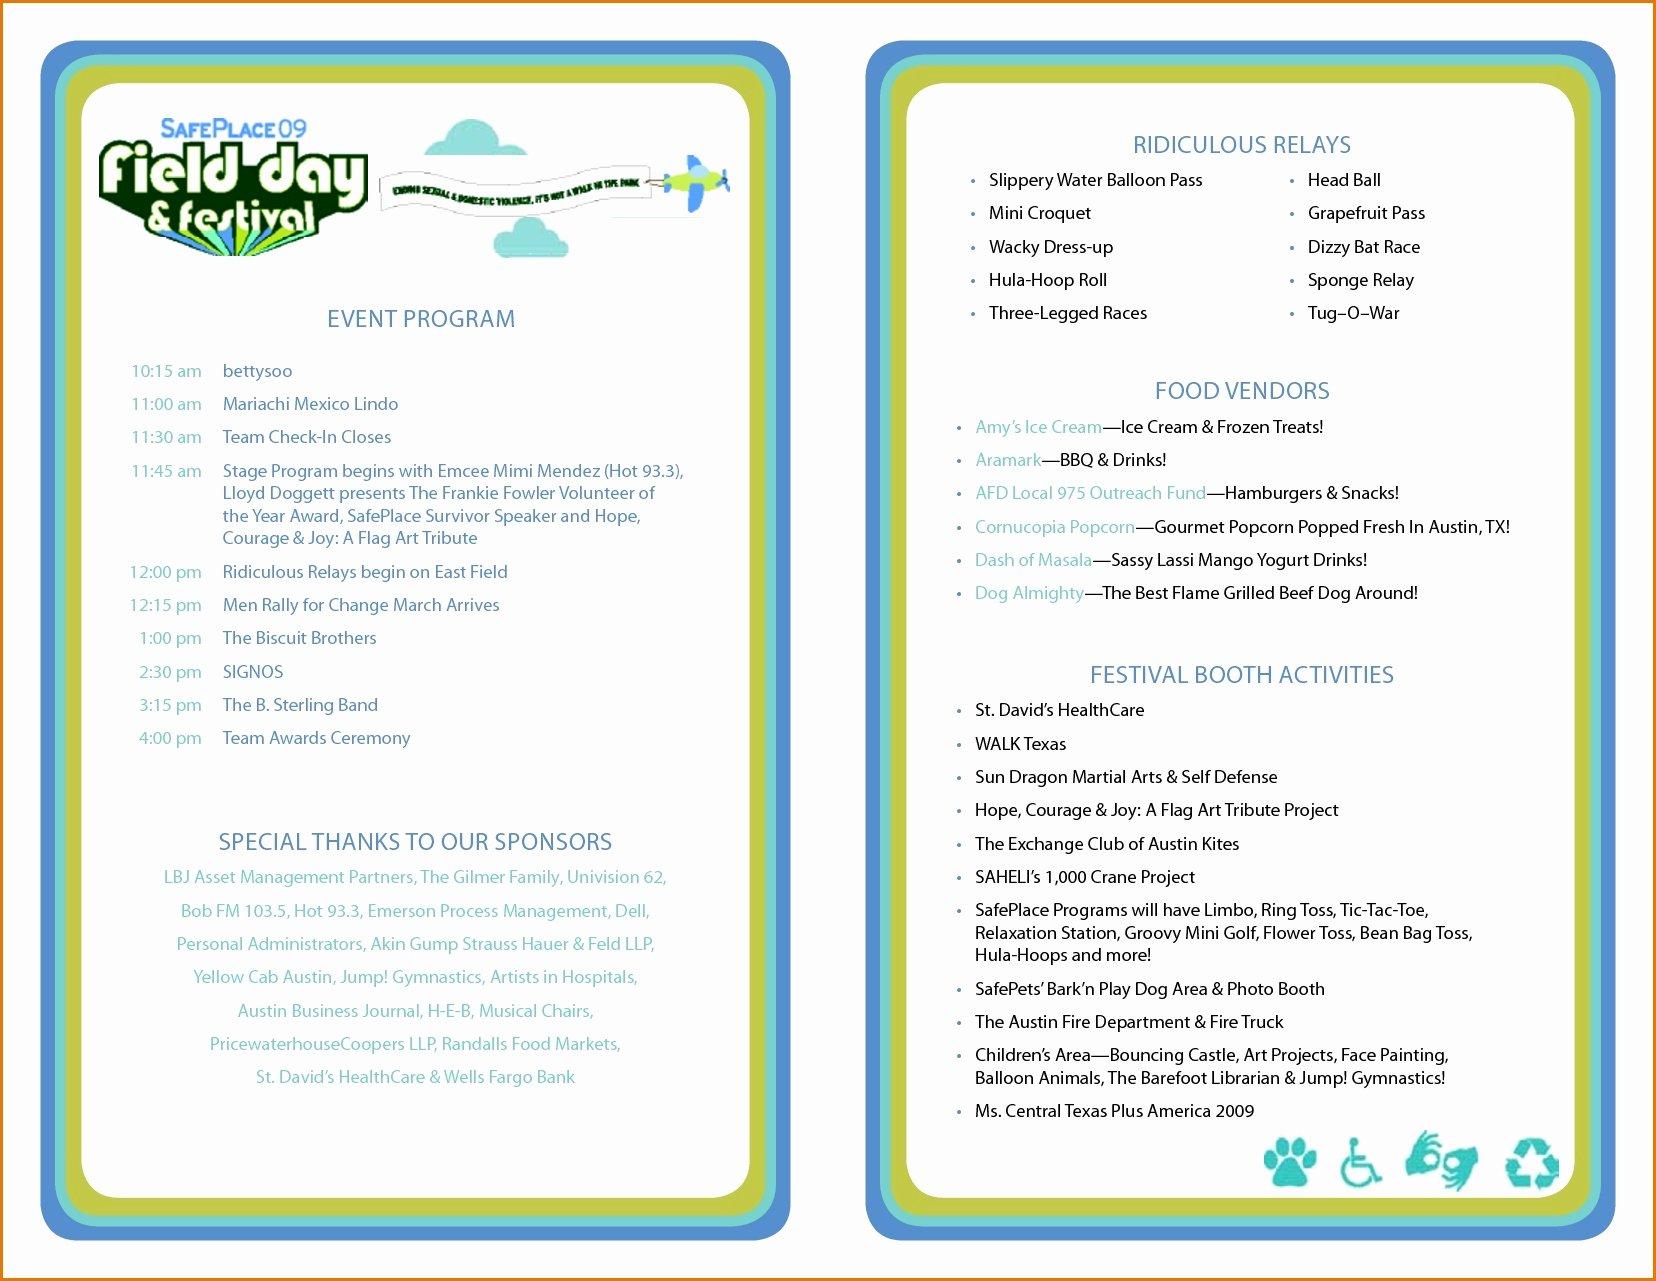 Free event Program Template Inspirational Printable event Program Template